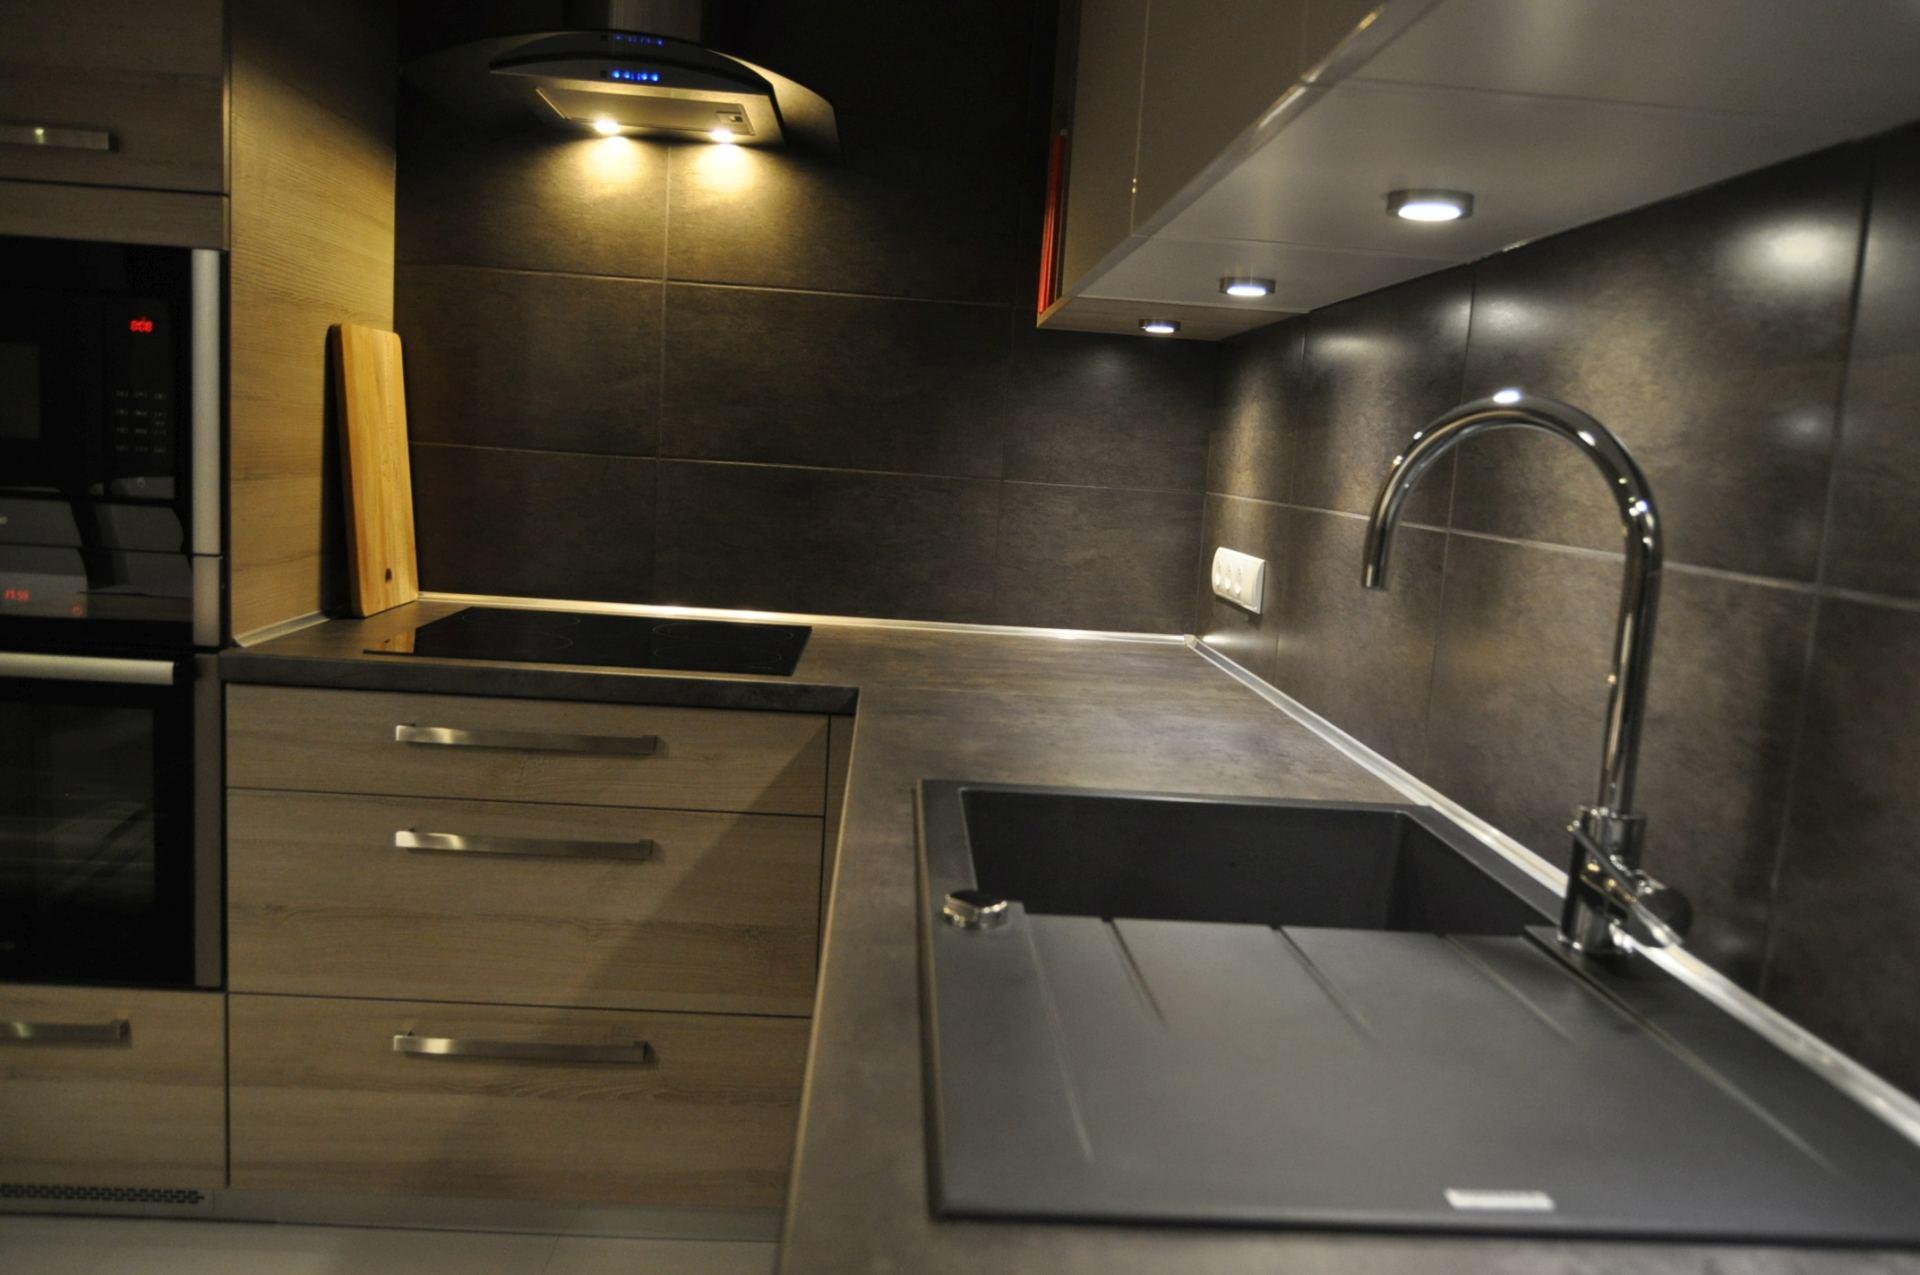 Meble Kuchenne Drewno I Grafit Questa Form Kuchnie Wnętrza